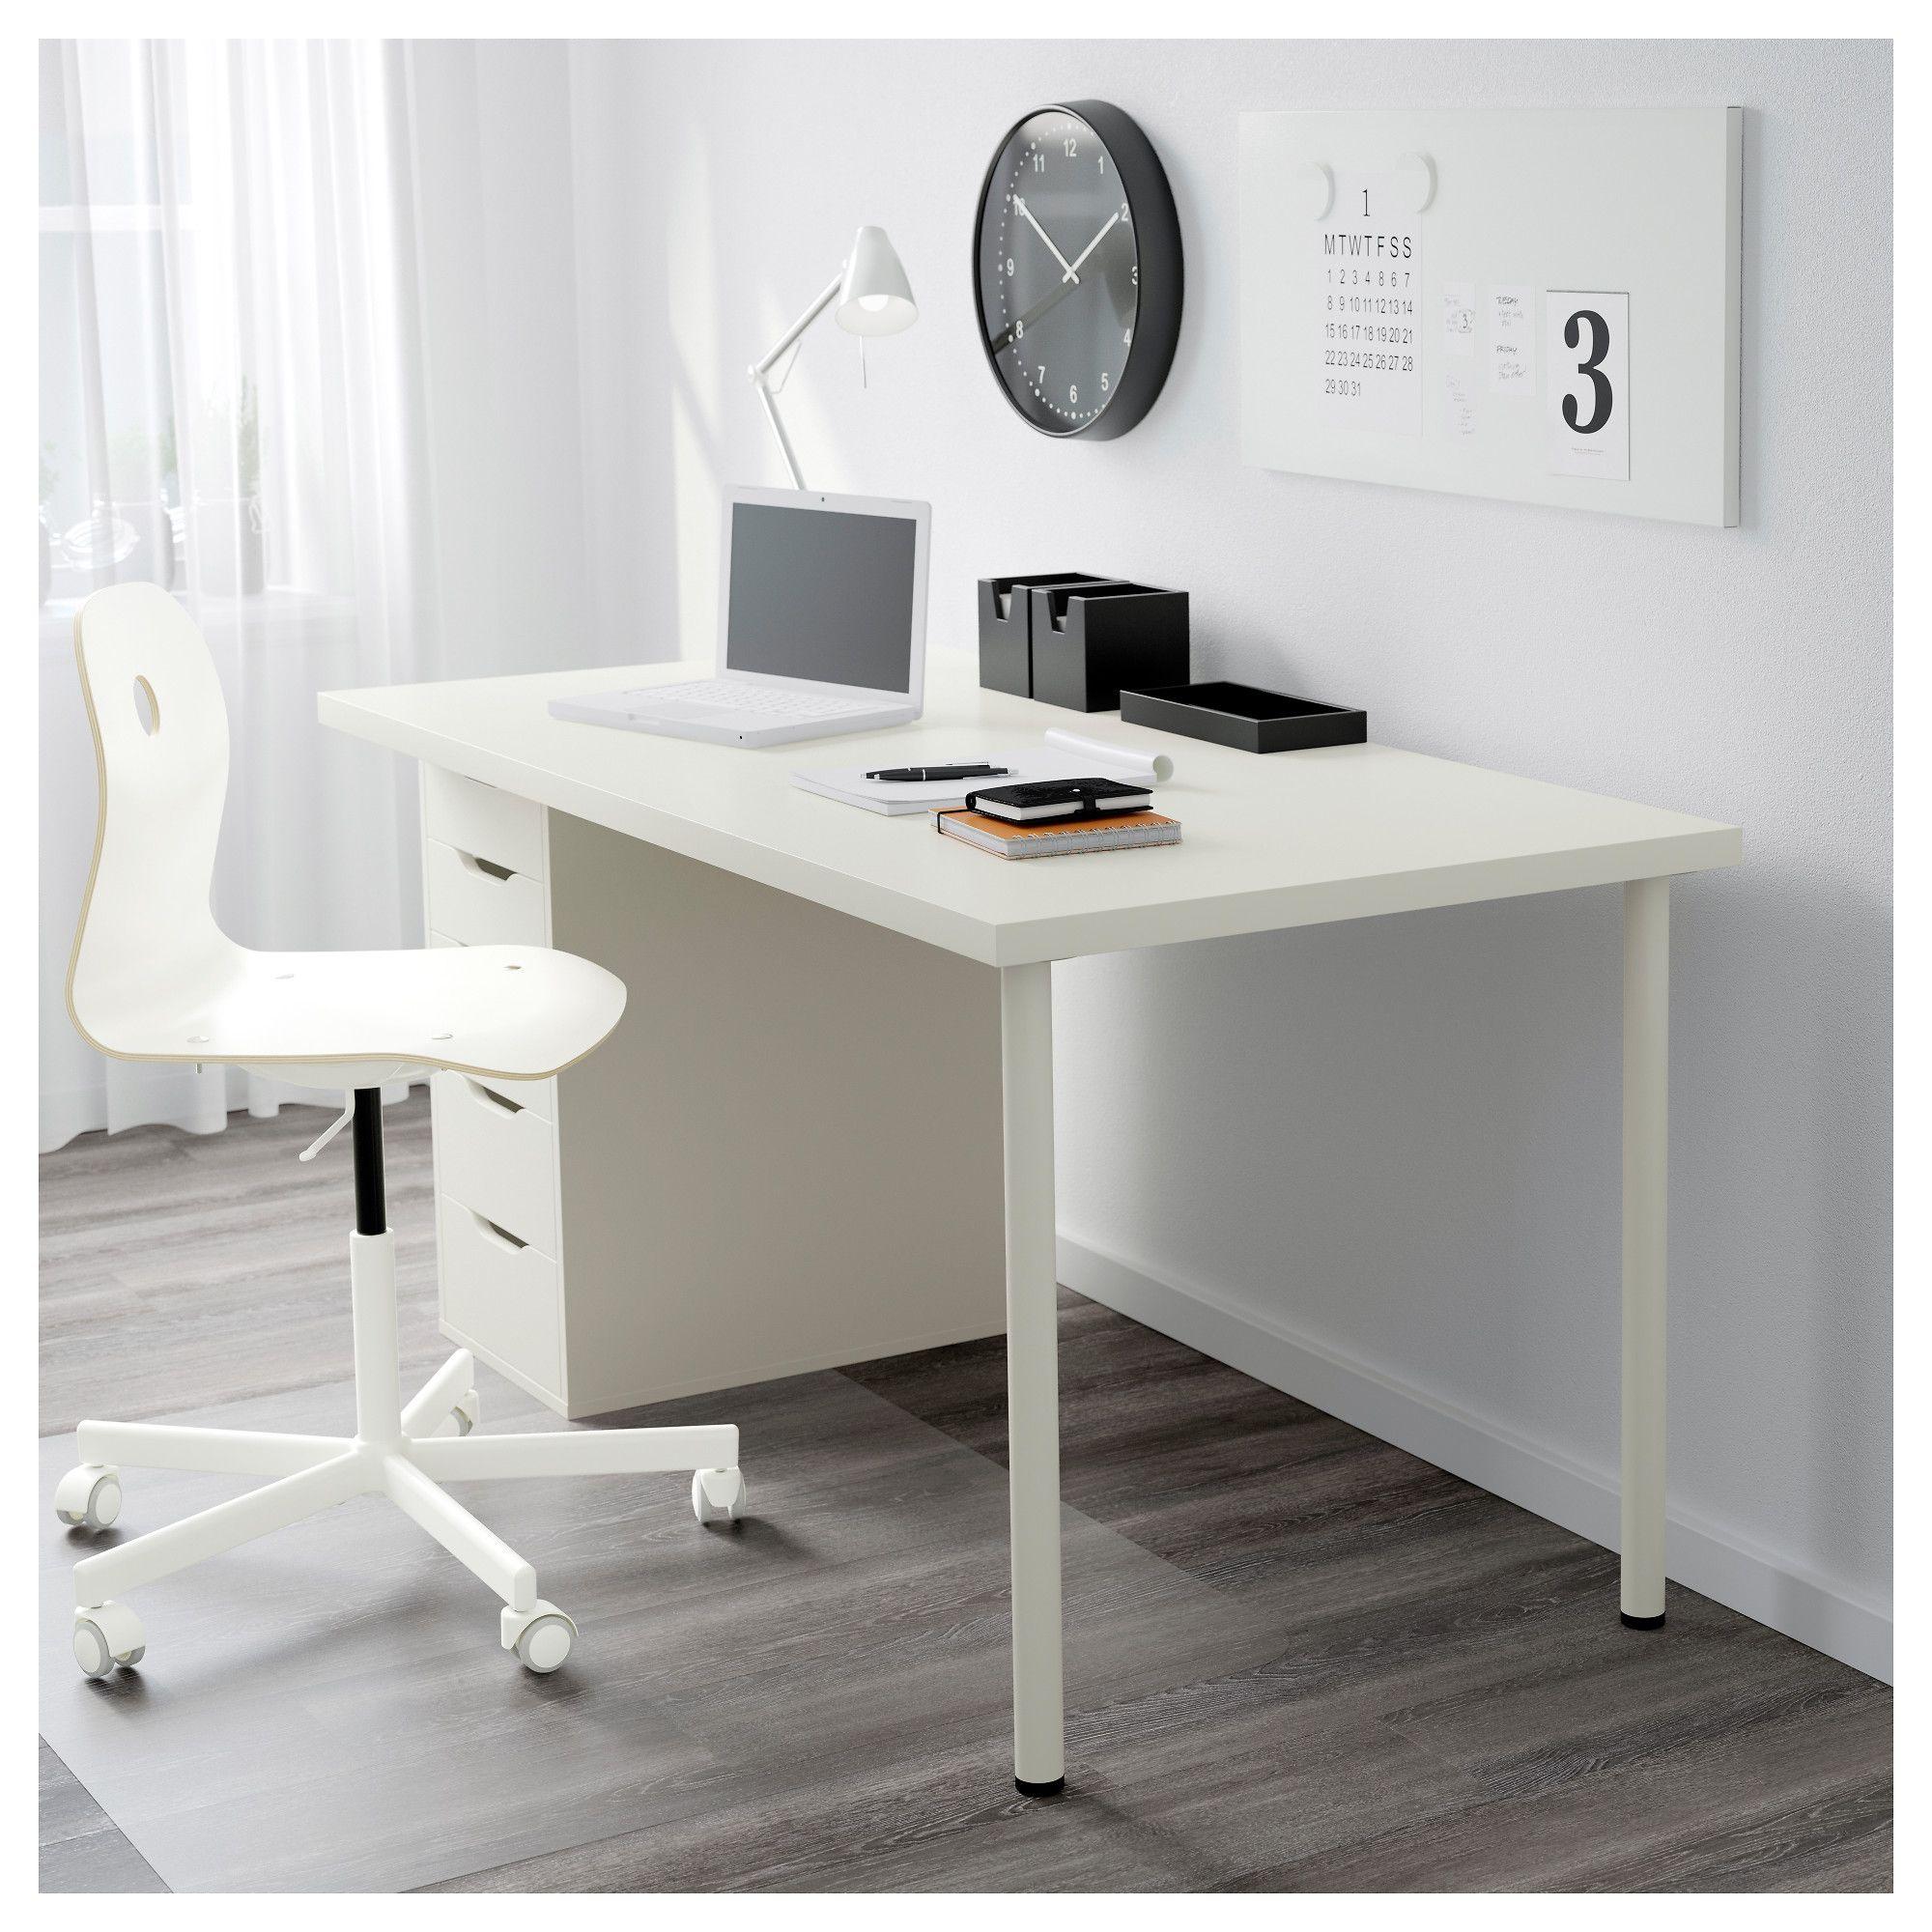 Linnmon Alex White Table 150x75 Cm Ikea Drawer Unit Home Office Desks Ikea